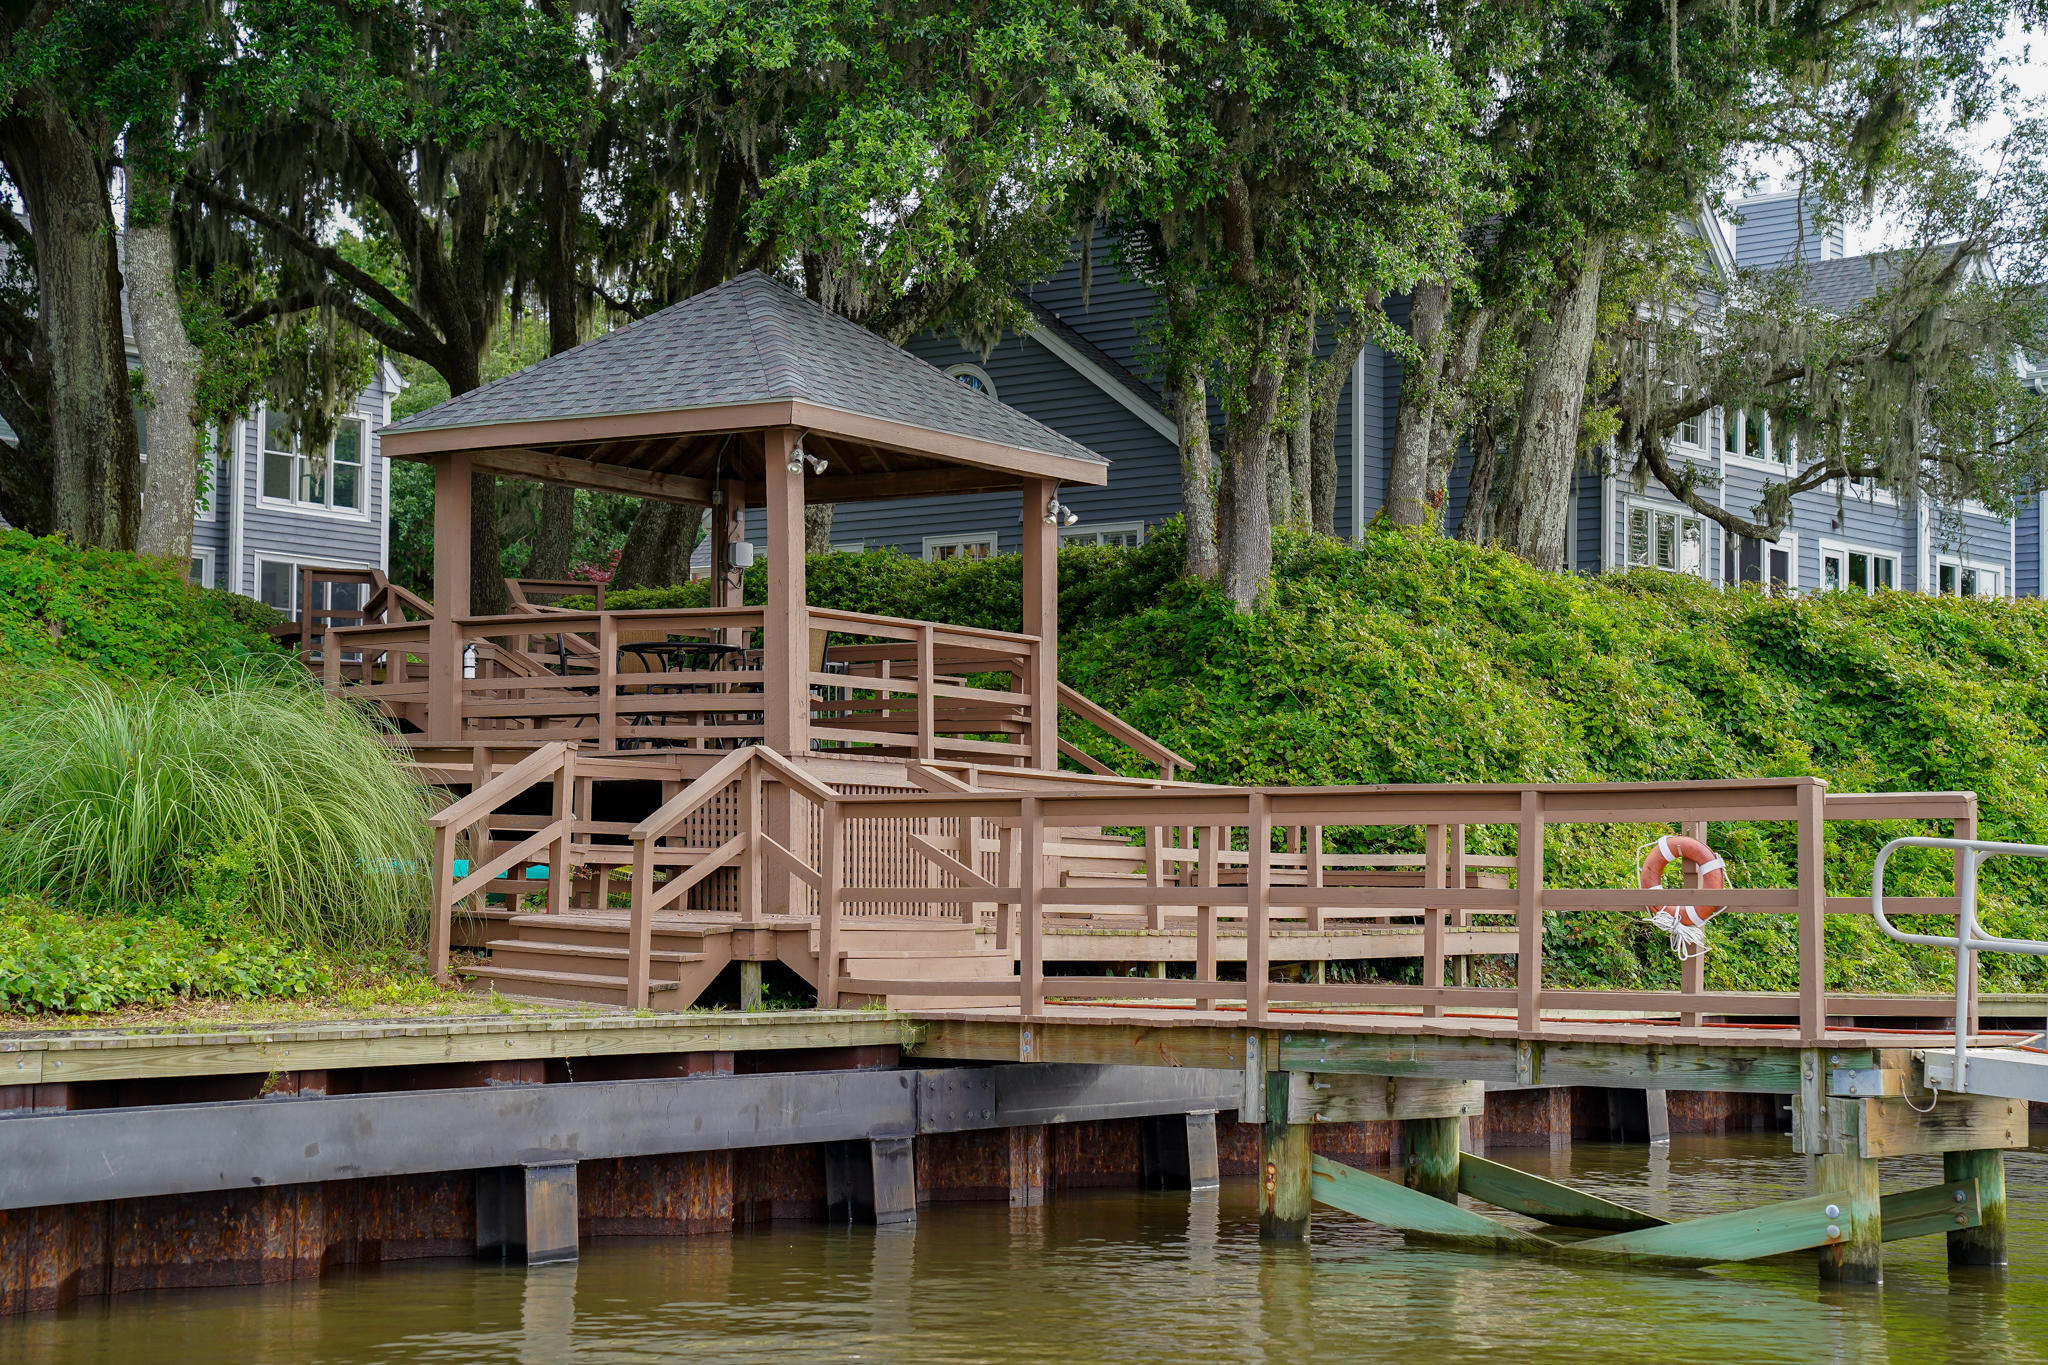 Waterfront Plantation Homes For Sale - 112 Waterfront Plantation, Charleston, SC - 24